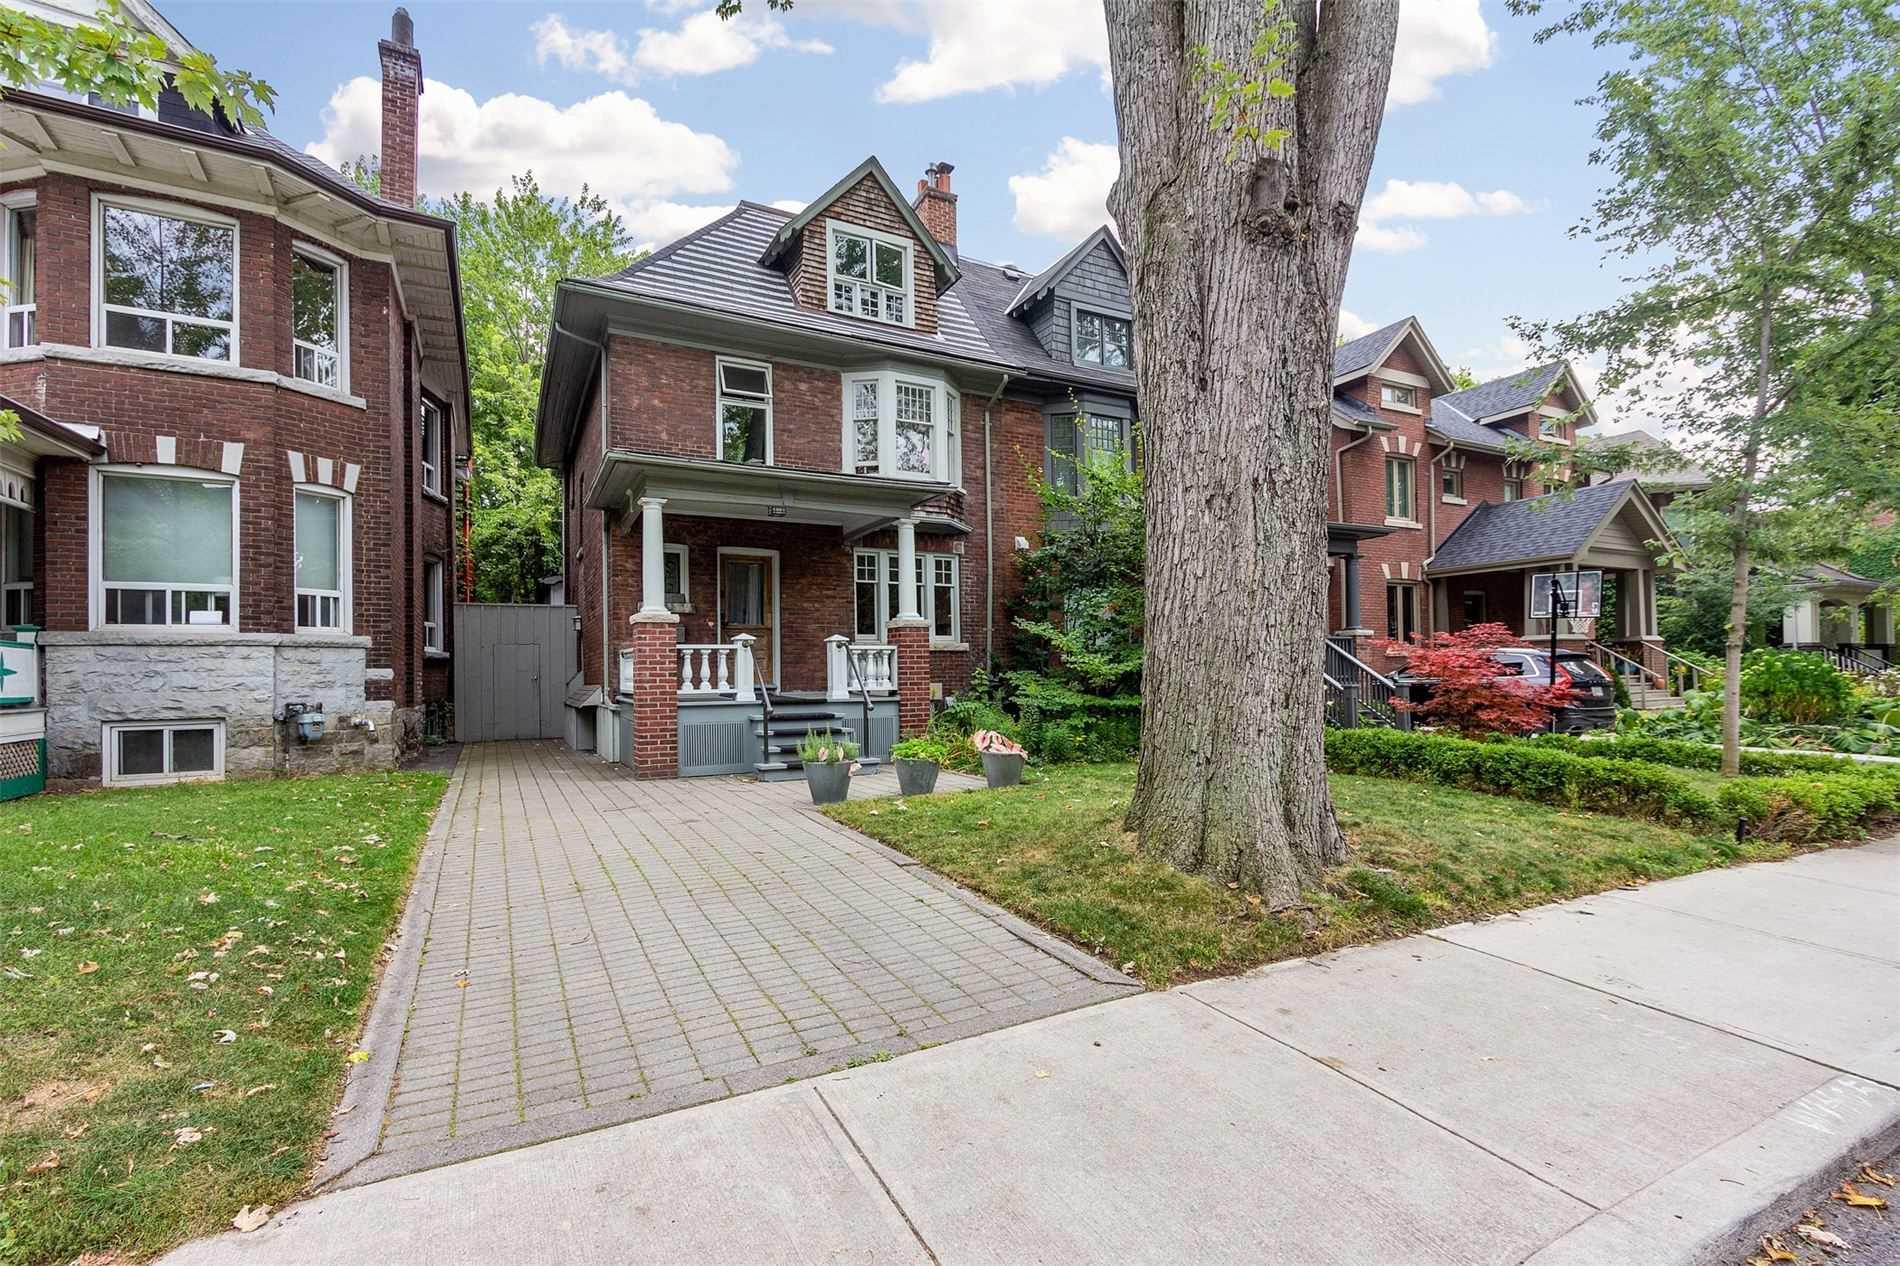 499 Palmerston Blvd, Toronto, Ontario M6G2P2, 3 Bedrooms Bedrooms, 15 Rooms Rooms,5 BathroomsBathrooms,Semi-detached,For Sale,Palmerston,C5275385